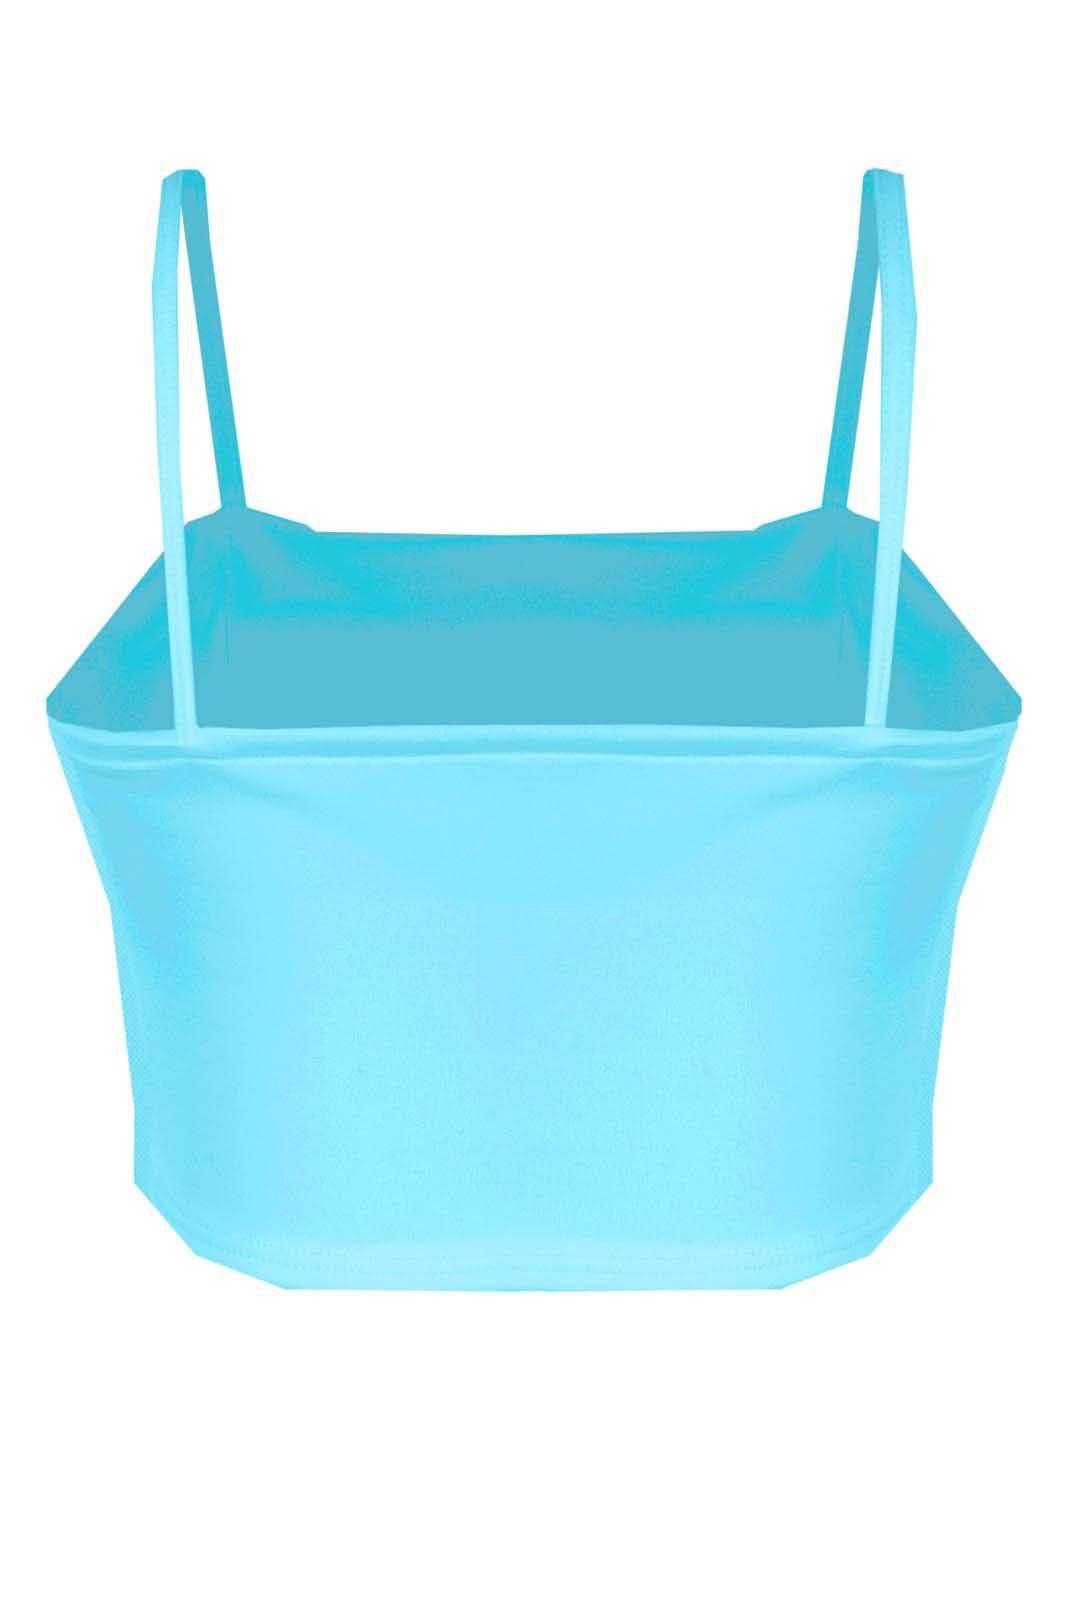 Top Outlet Dri Cropped Básico Alcinha Neoprene Bojo Azul Bebê